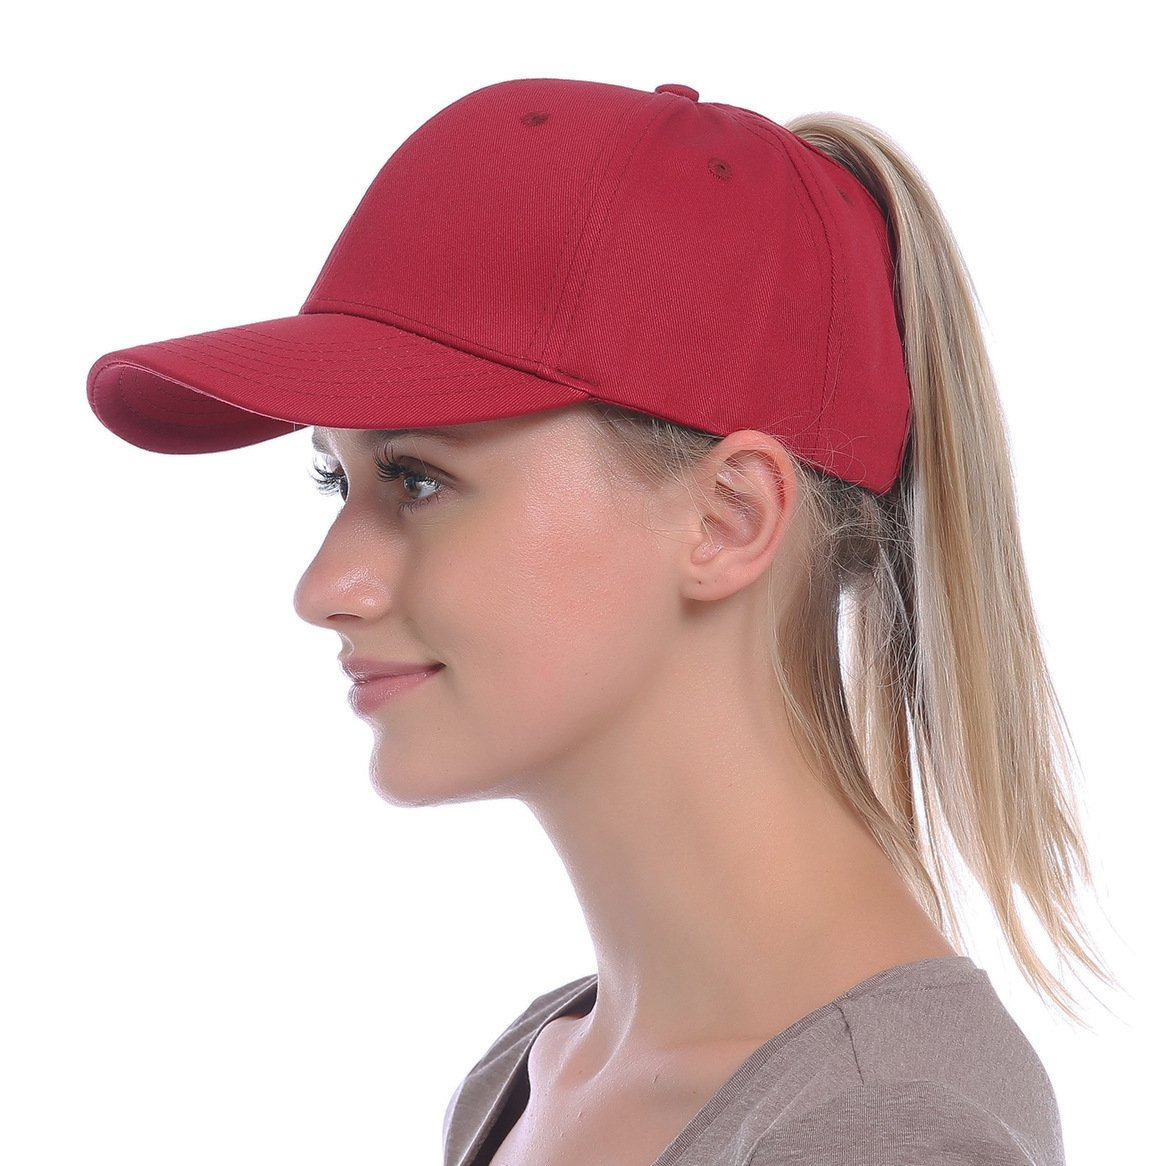 JAKY Global Ponytail Baseball Cap Messy Bun Adjustable Mesh Trucker Cotton Hats  Women(Grey) at Amazon Women s Clothing store  a8627680000e